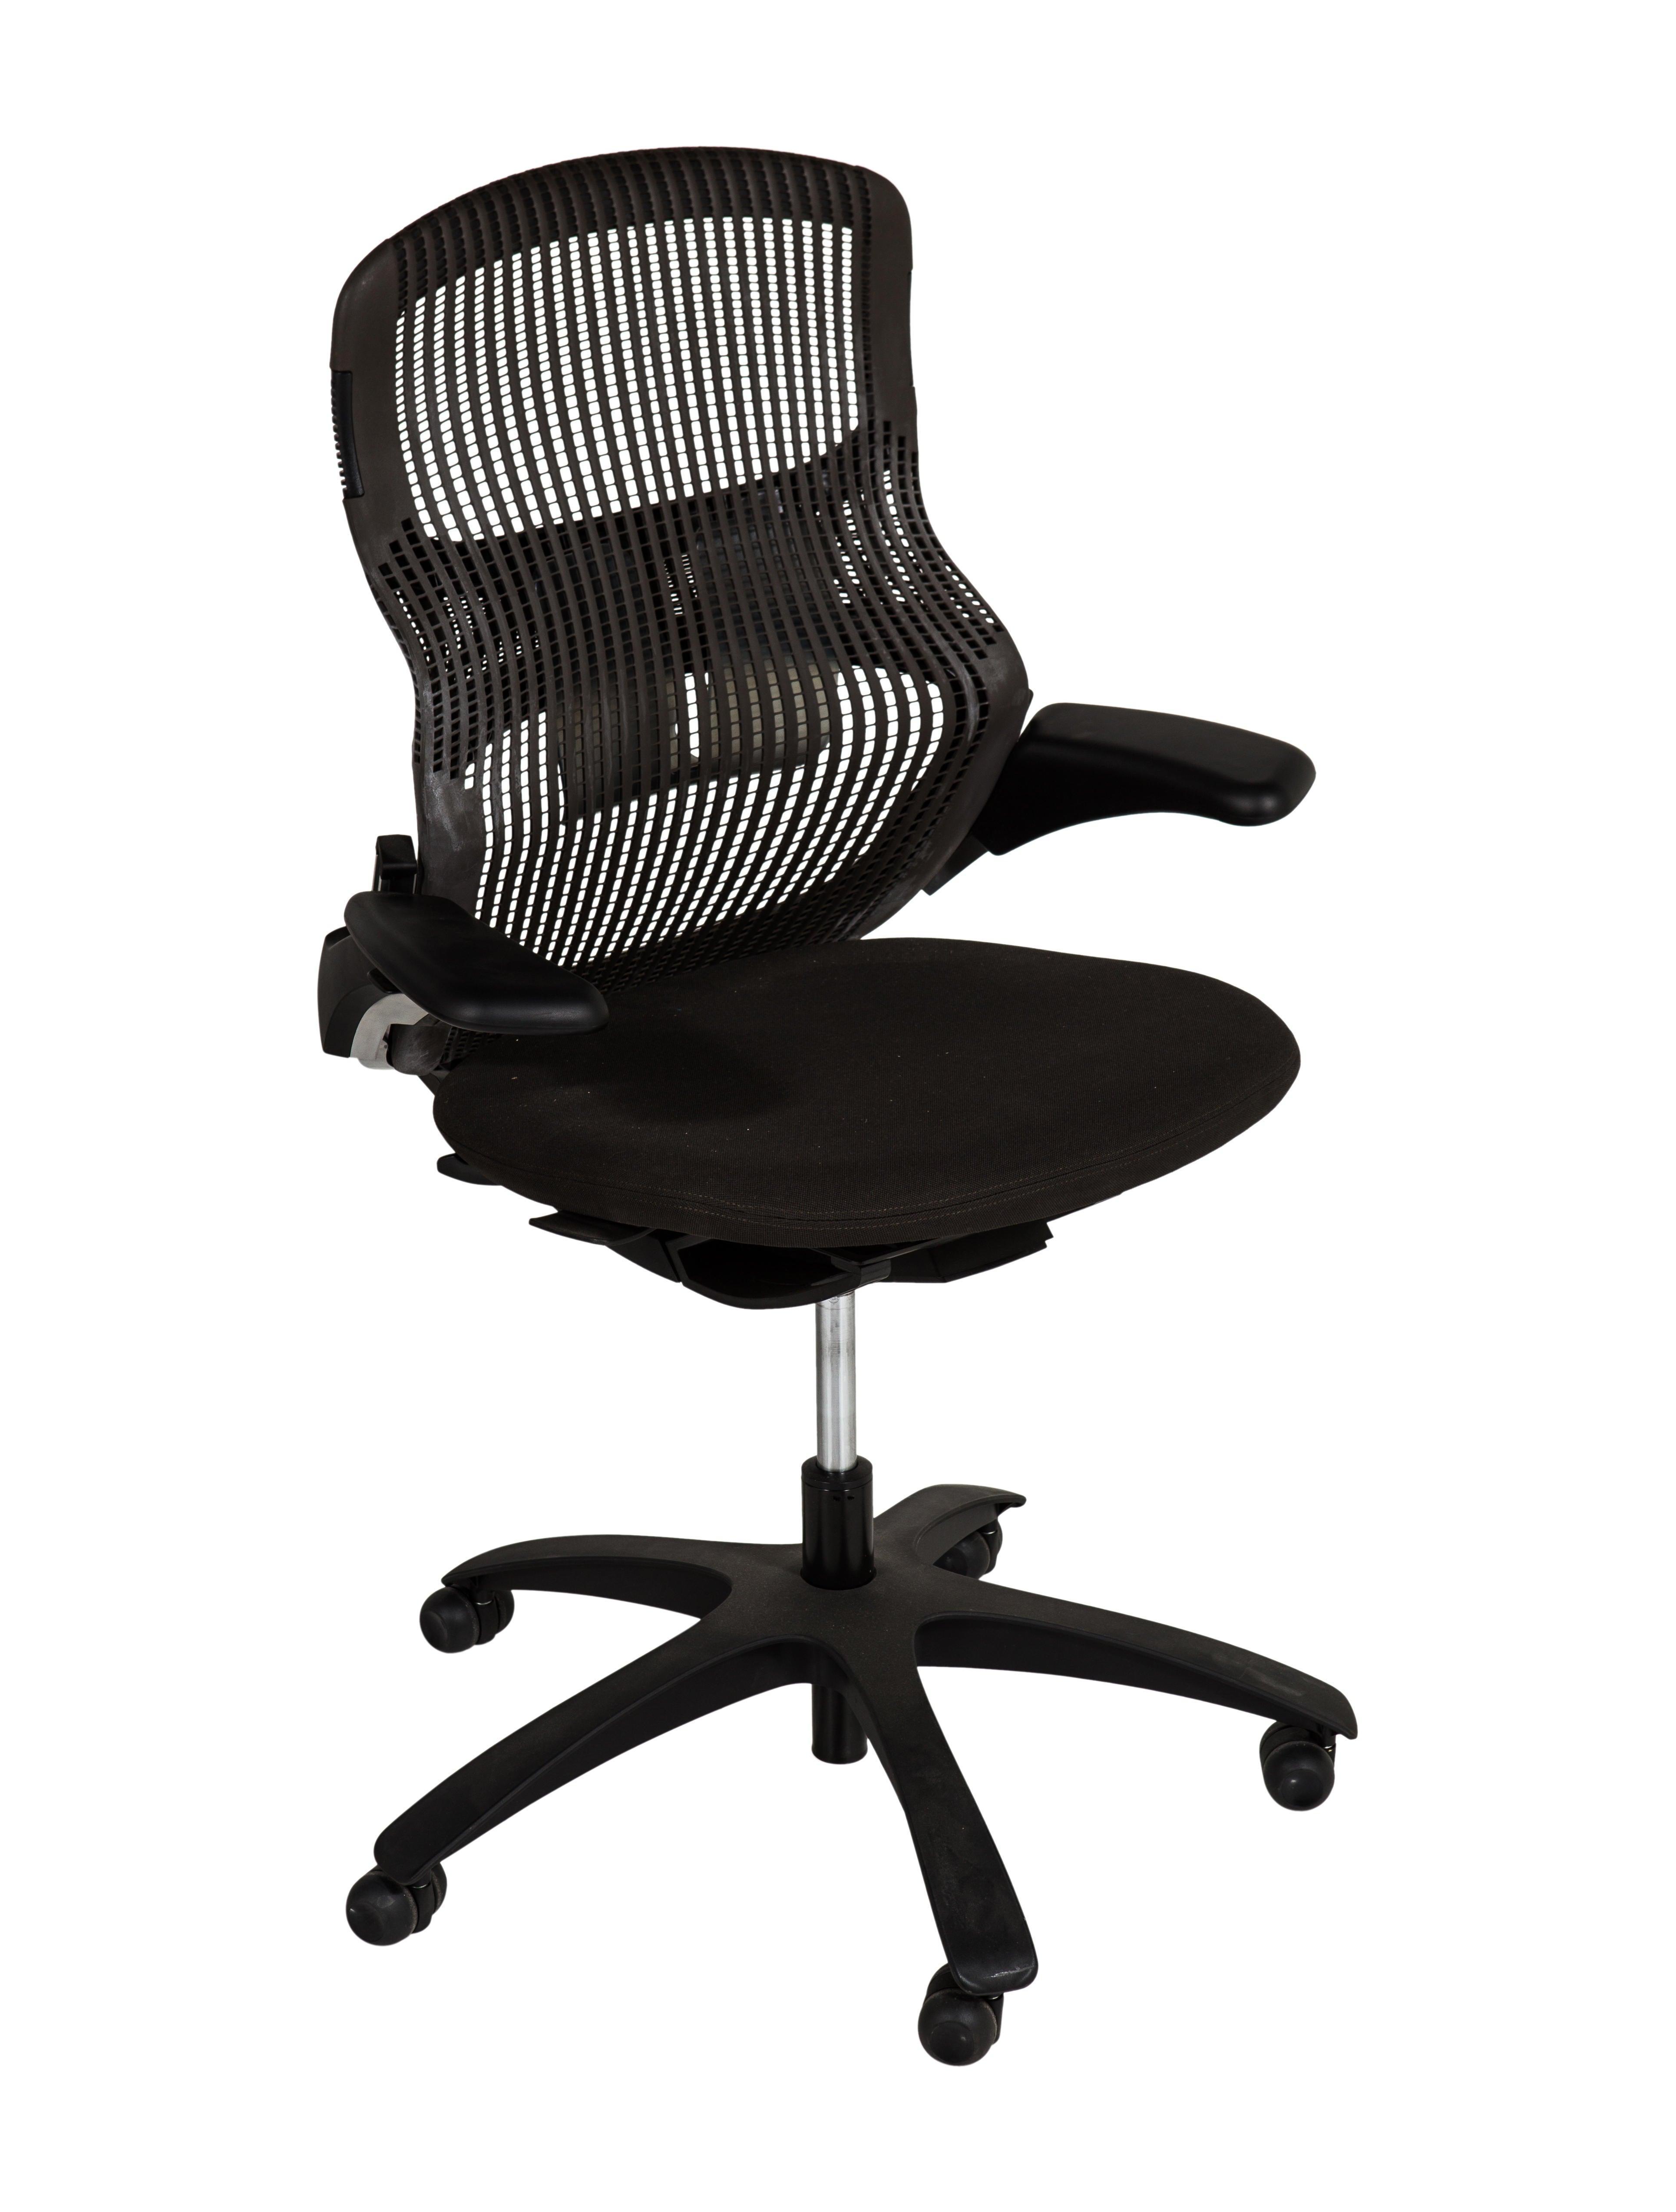 Generation Desk Chair